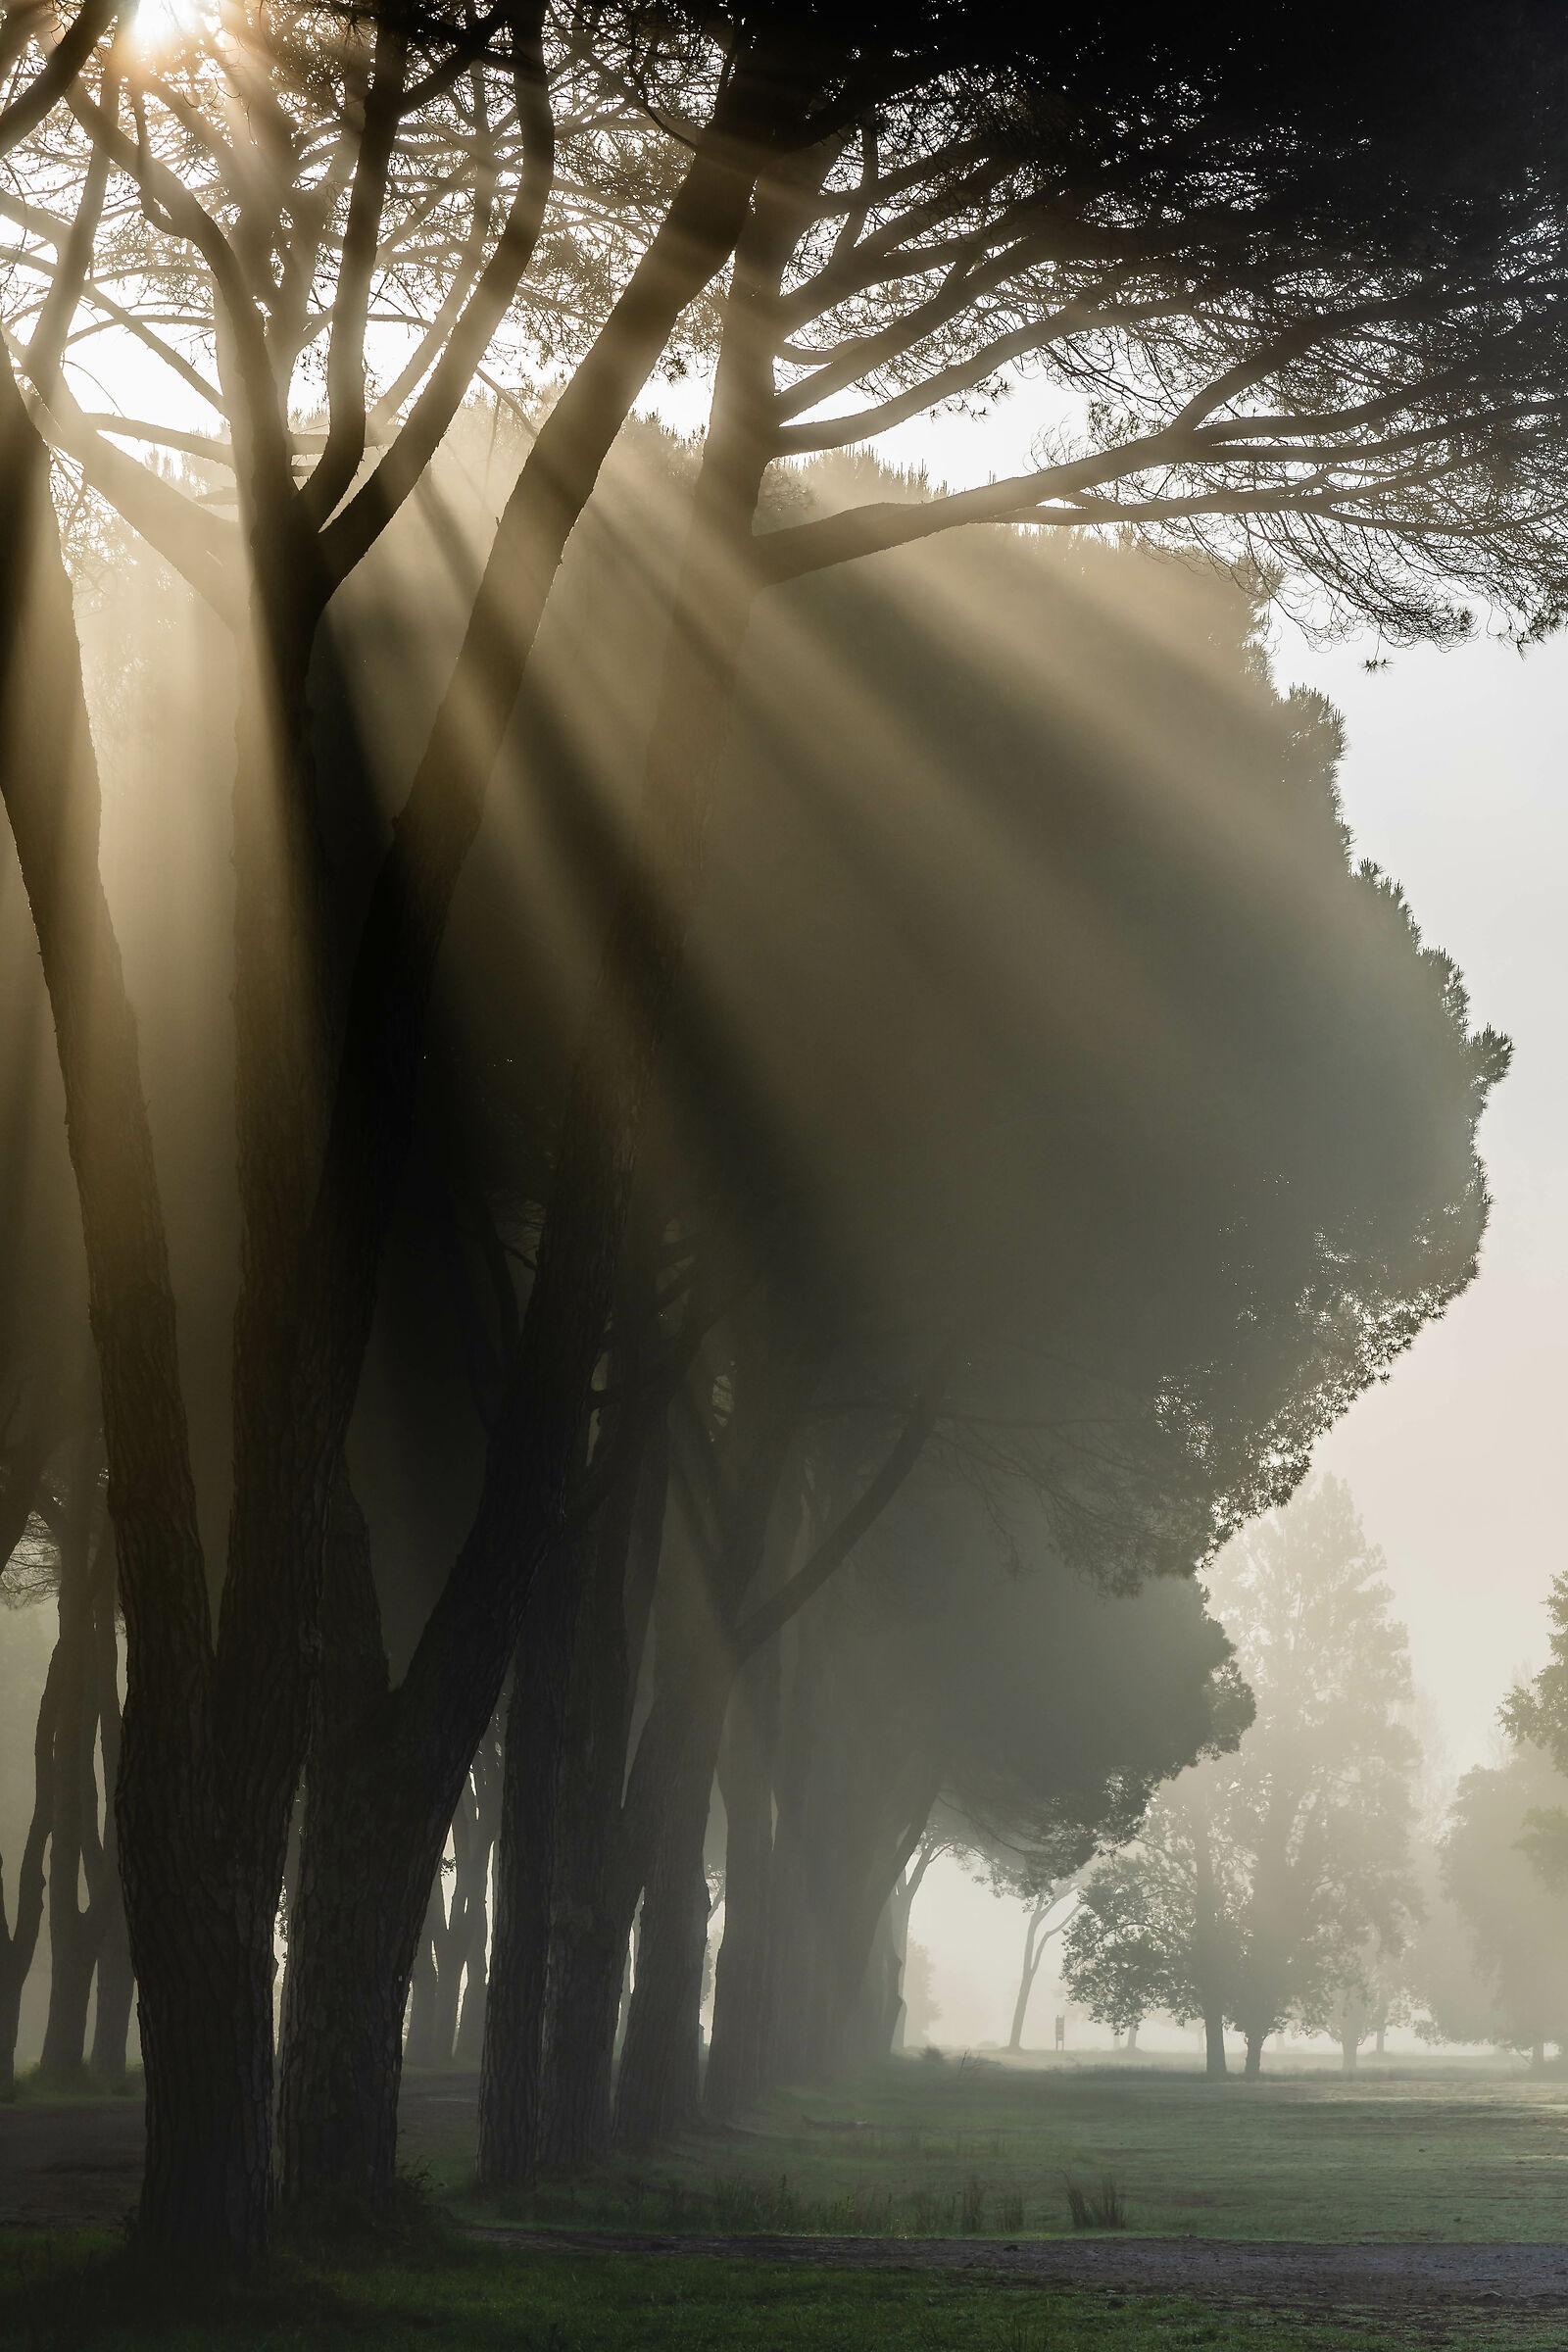 Spiragli of Light...